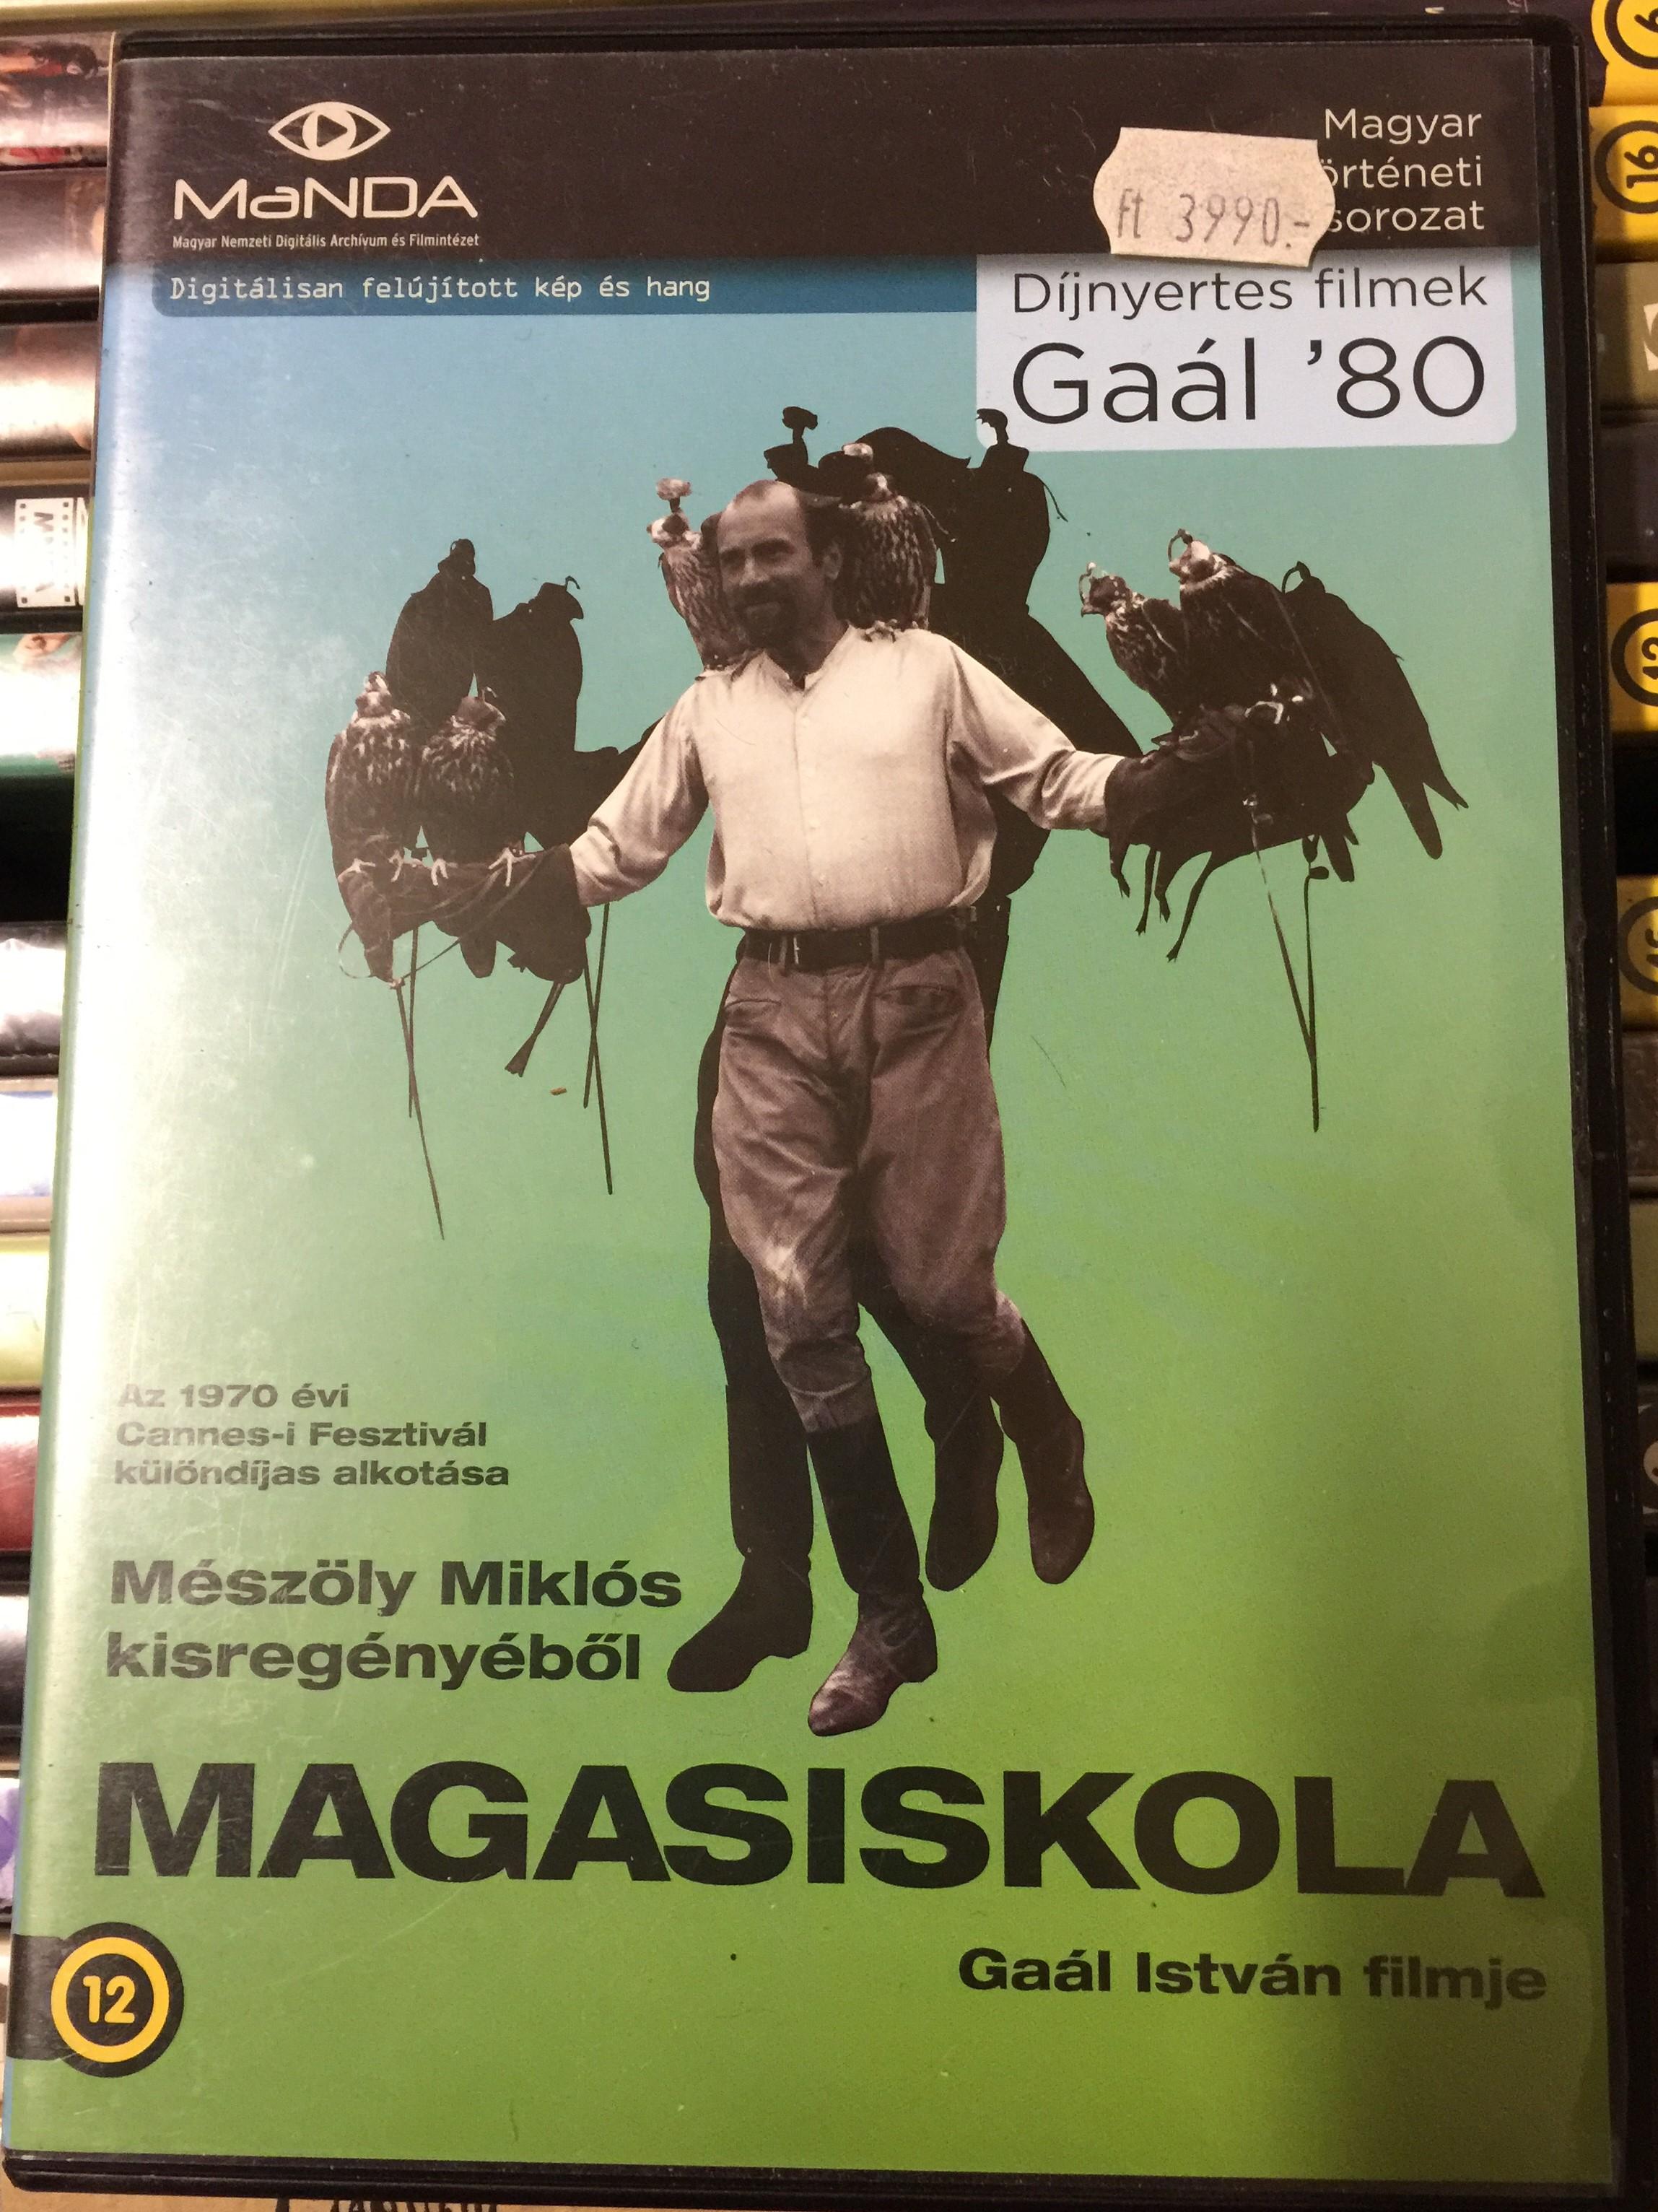 magasiskola-dvd-1970-the-falcons-directed-by-ga-l-istv-n-1.jpg